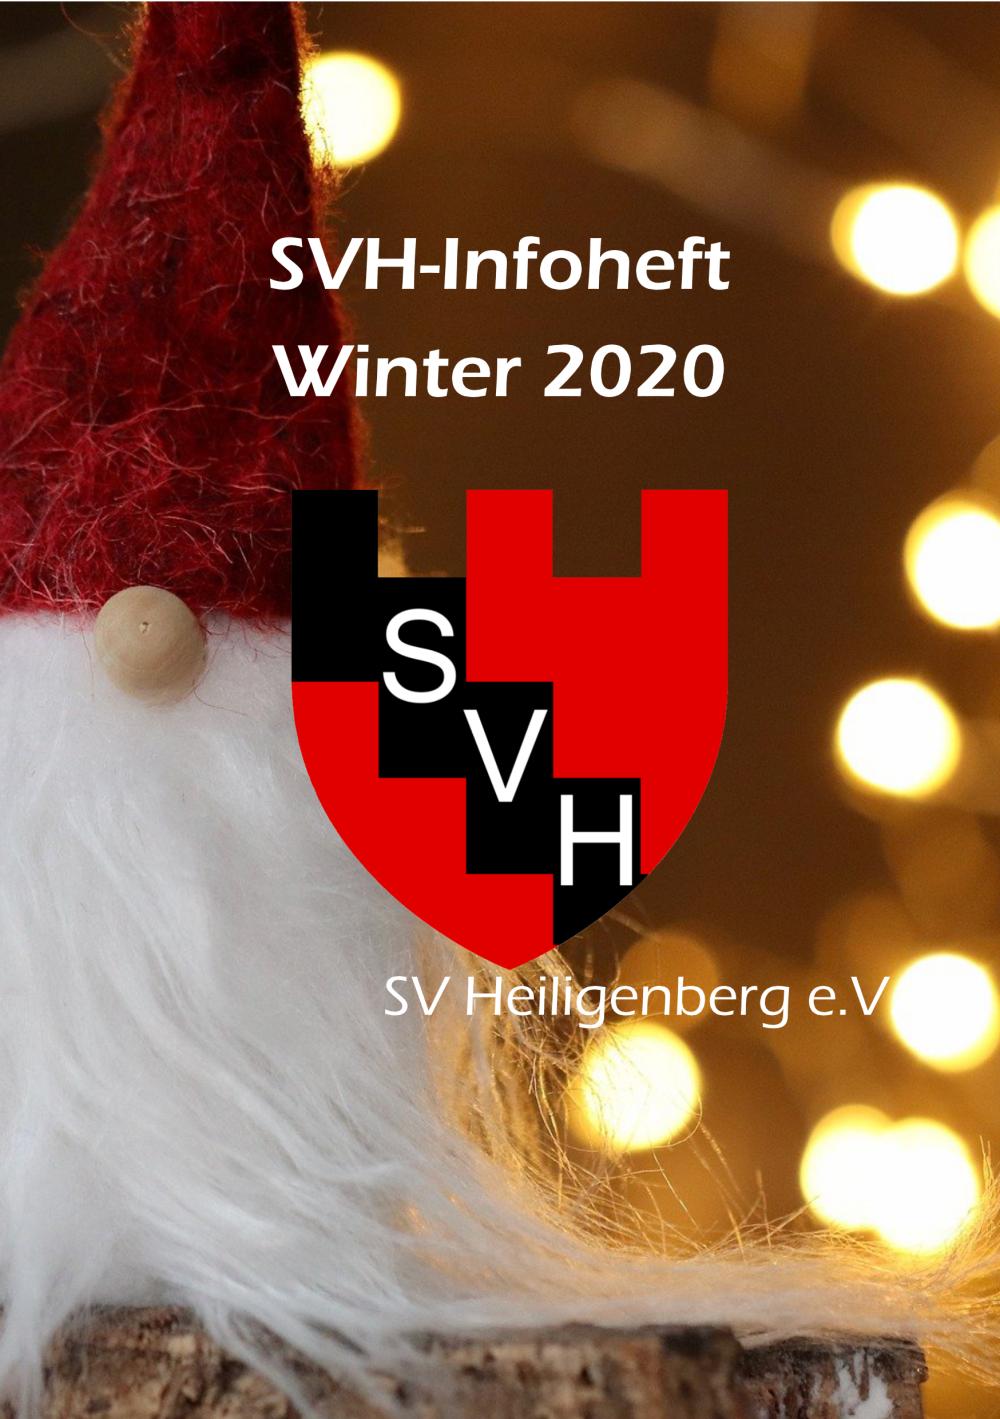 SVH-Infoheft-Advent2020-web-Seite001.png